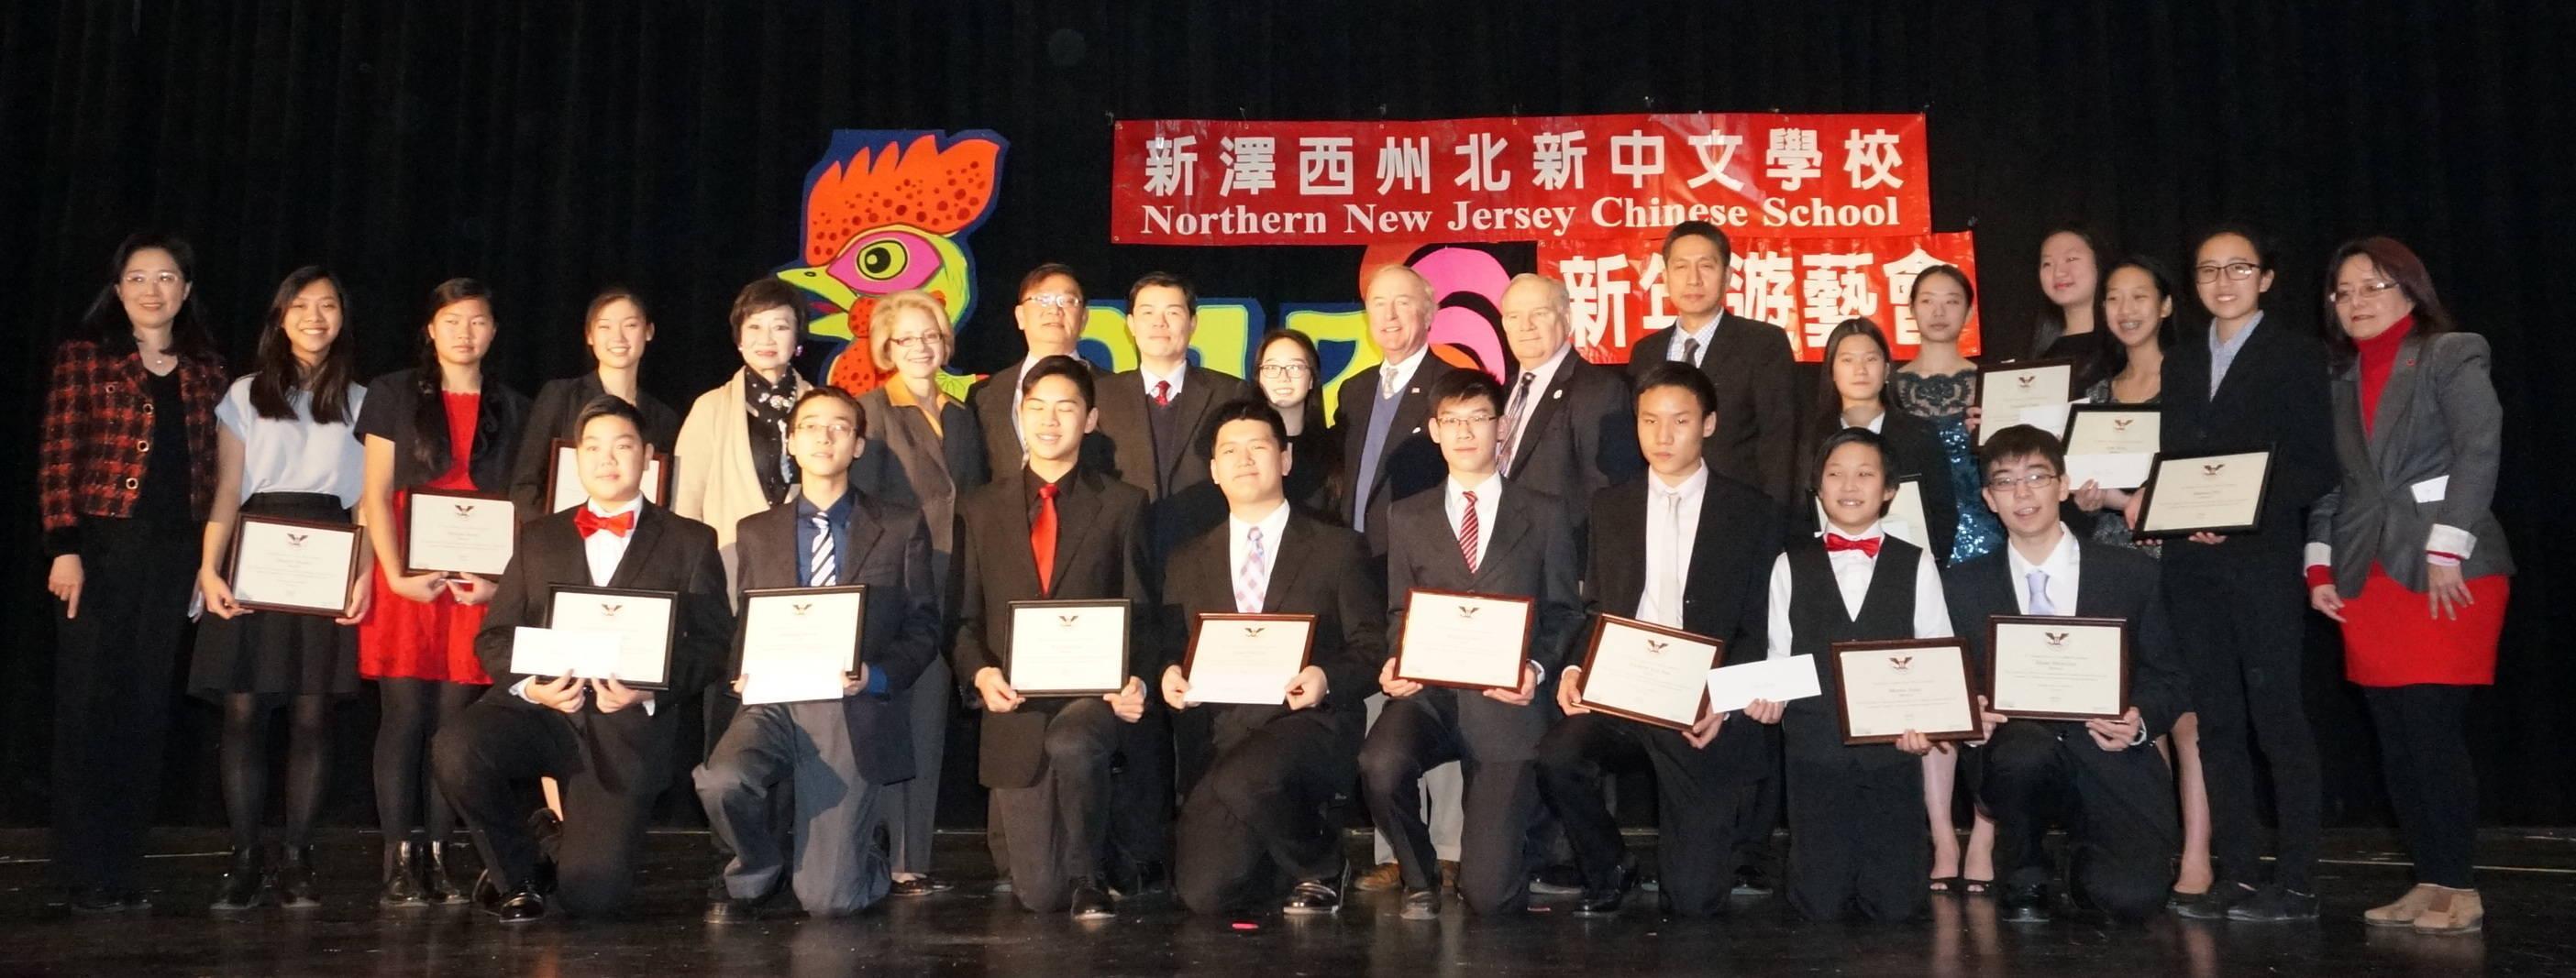 President's Volunteer Service Award Recipients in Montville-Based Chinese School